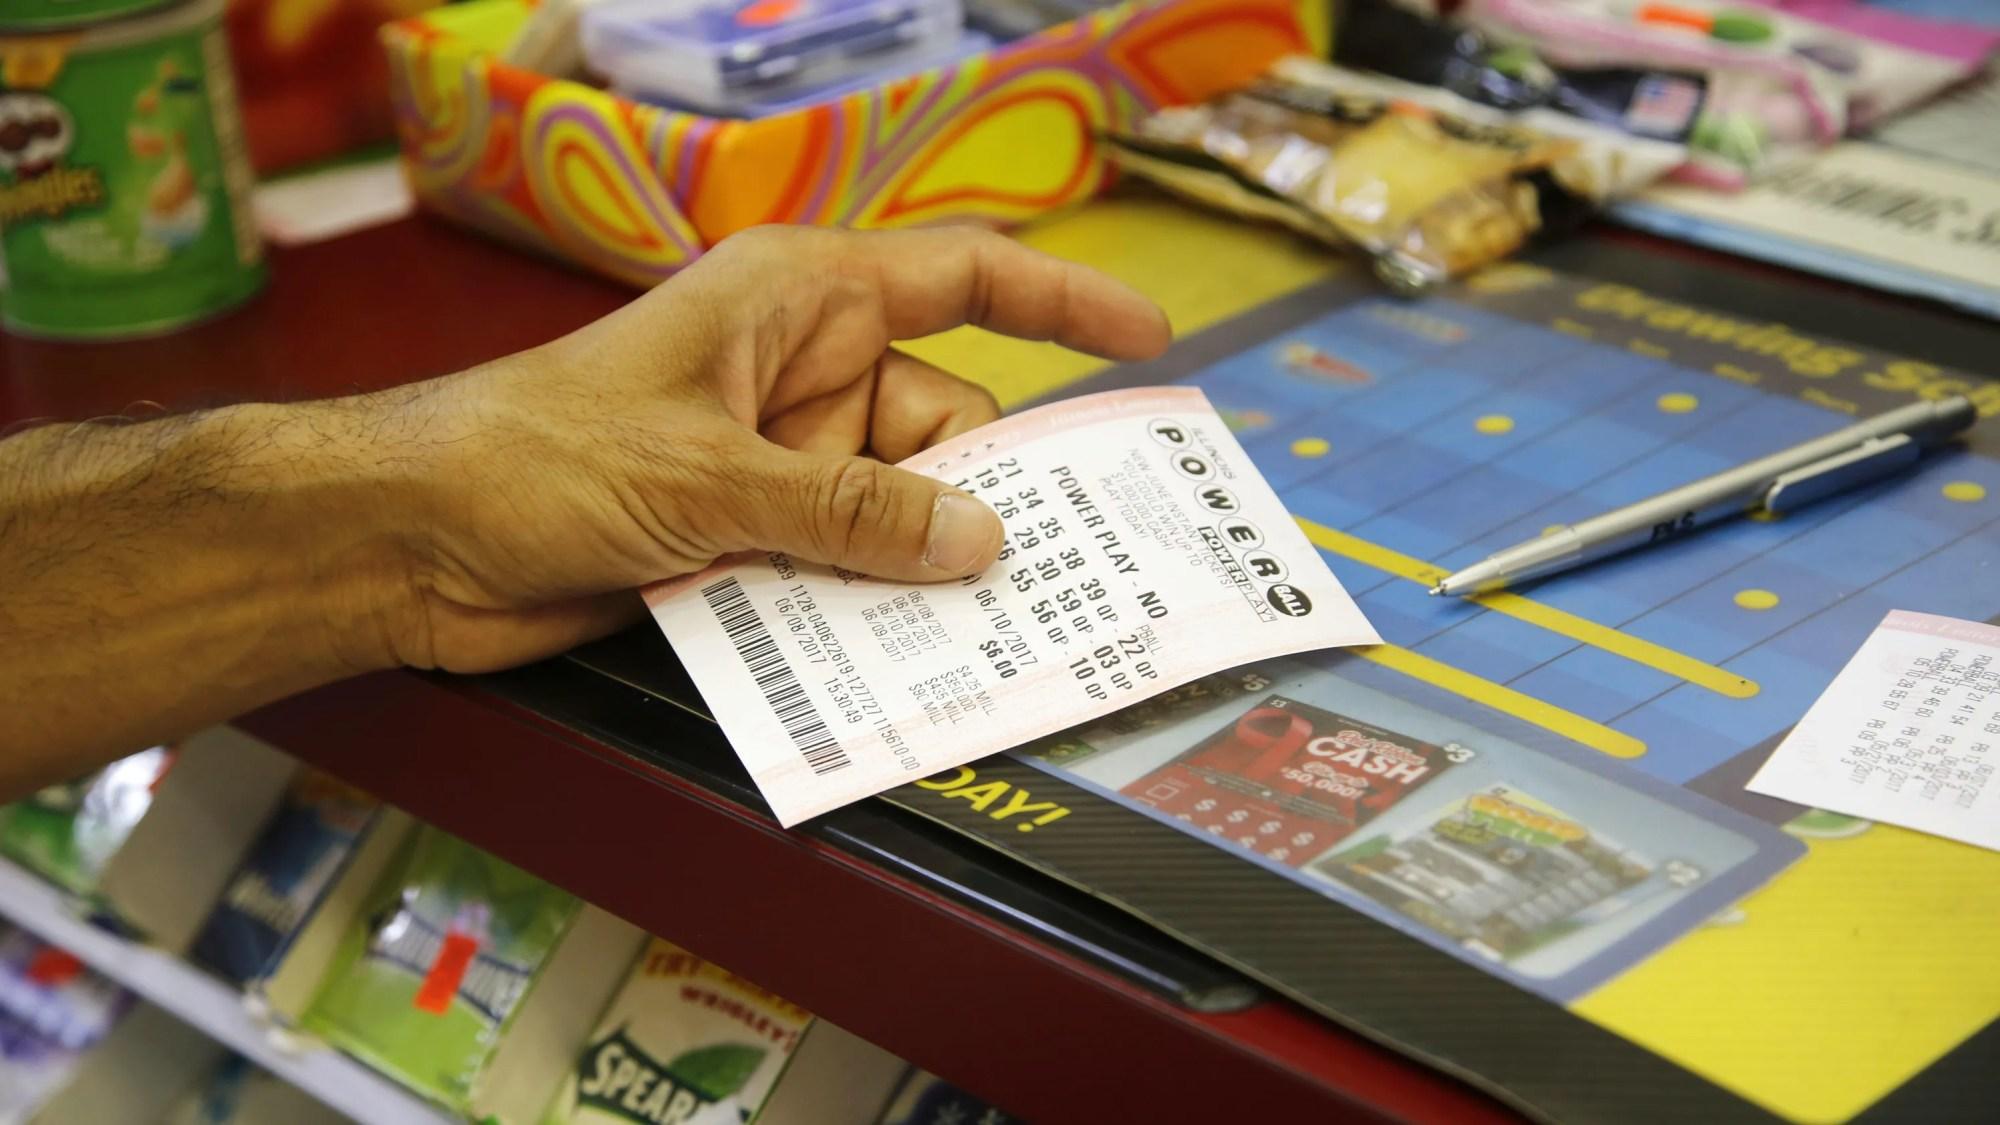 hight resolution of upi com 1 winning powerball ticket sold in calif worth 447m